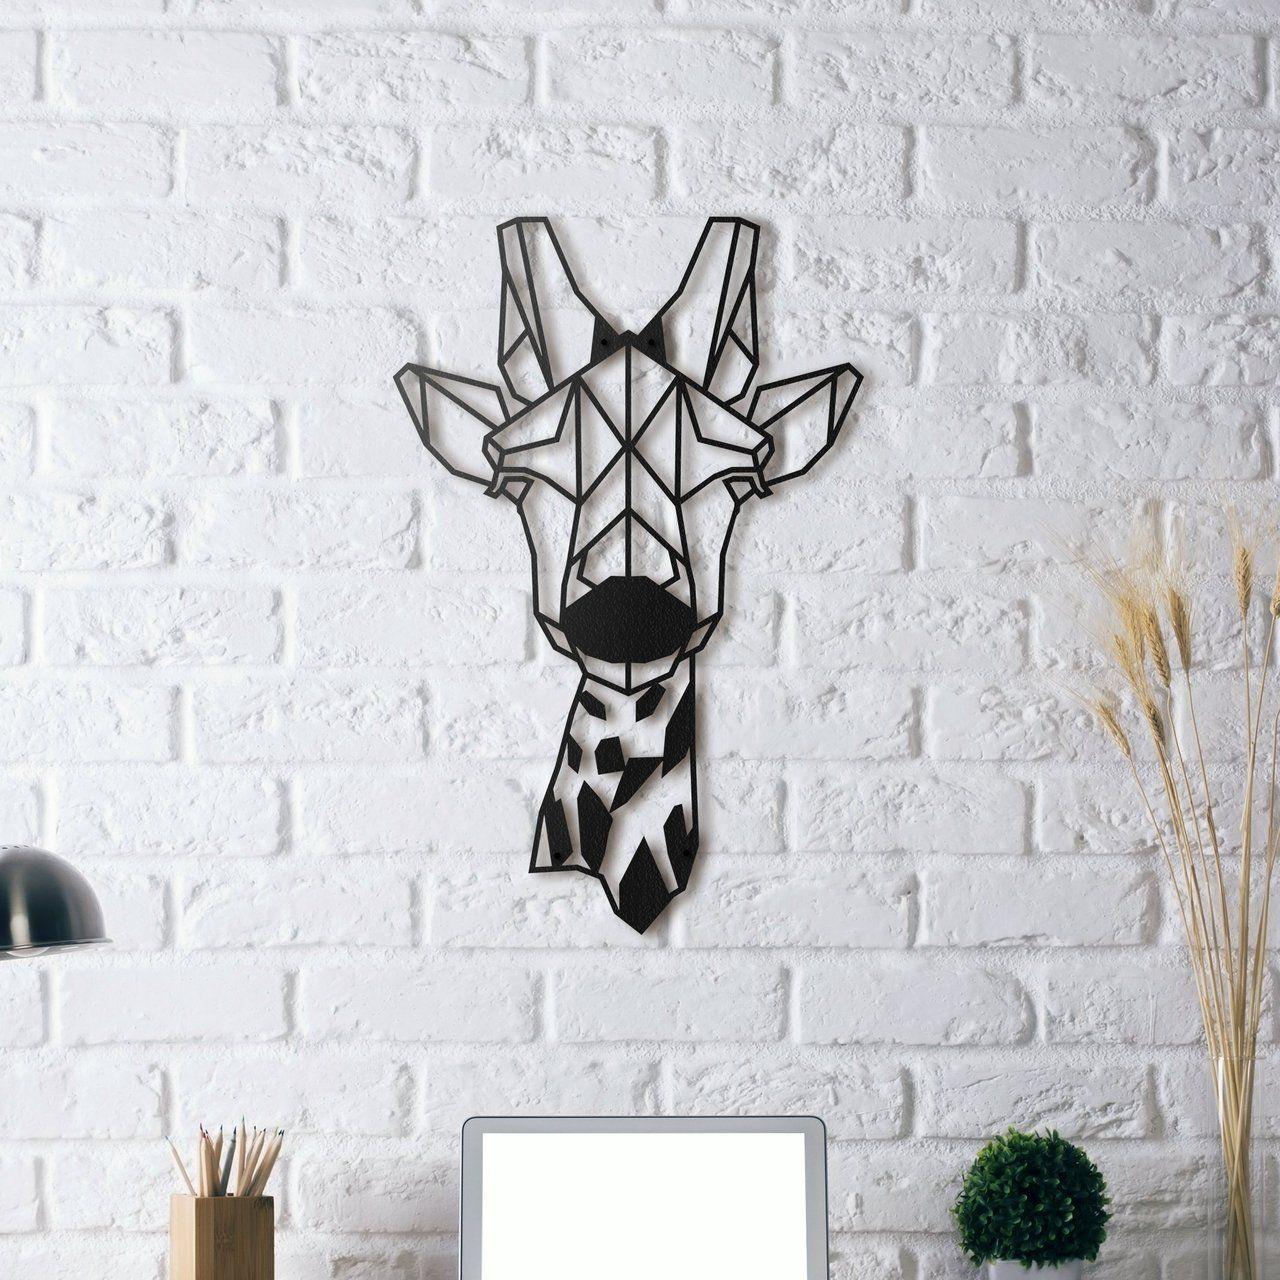 Giraffe Metal Wall Art Metal Art Welded Metal Wall Decor